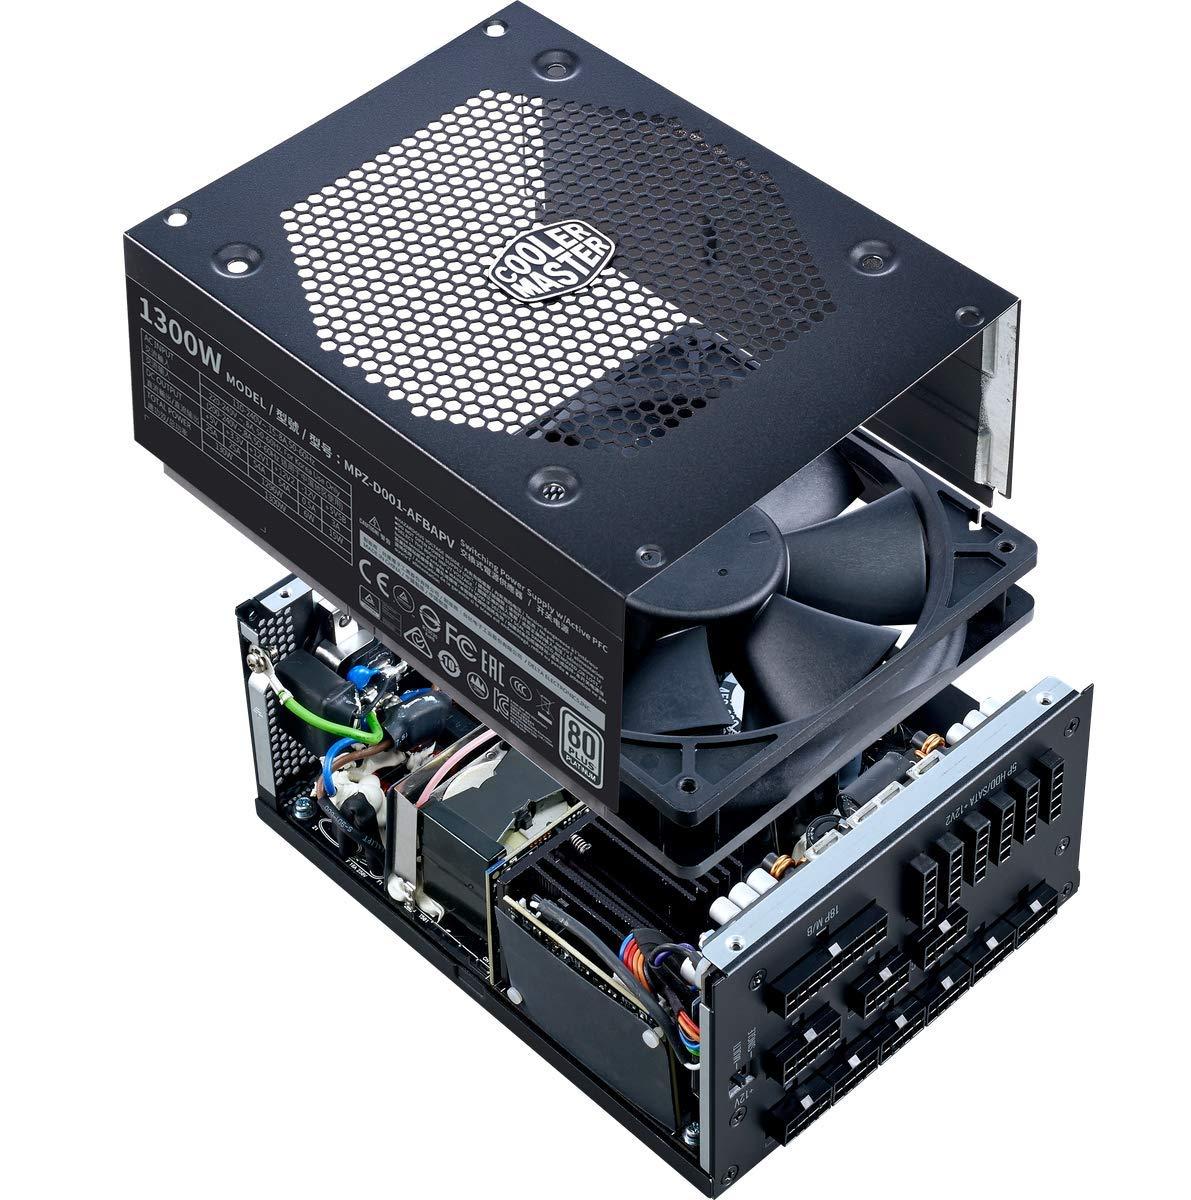 Cooler Master V1300 Platinum - Full-Modular 80 Plus Platinum Certified  Power Supply